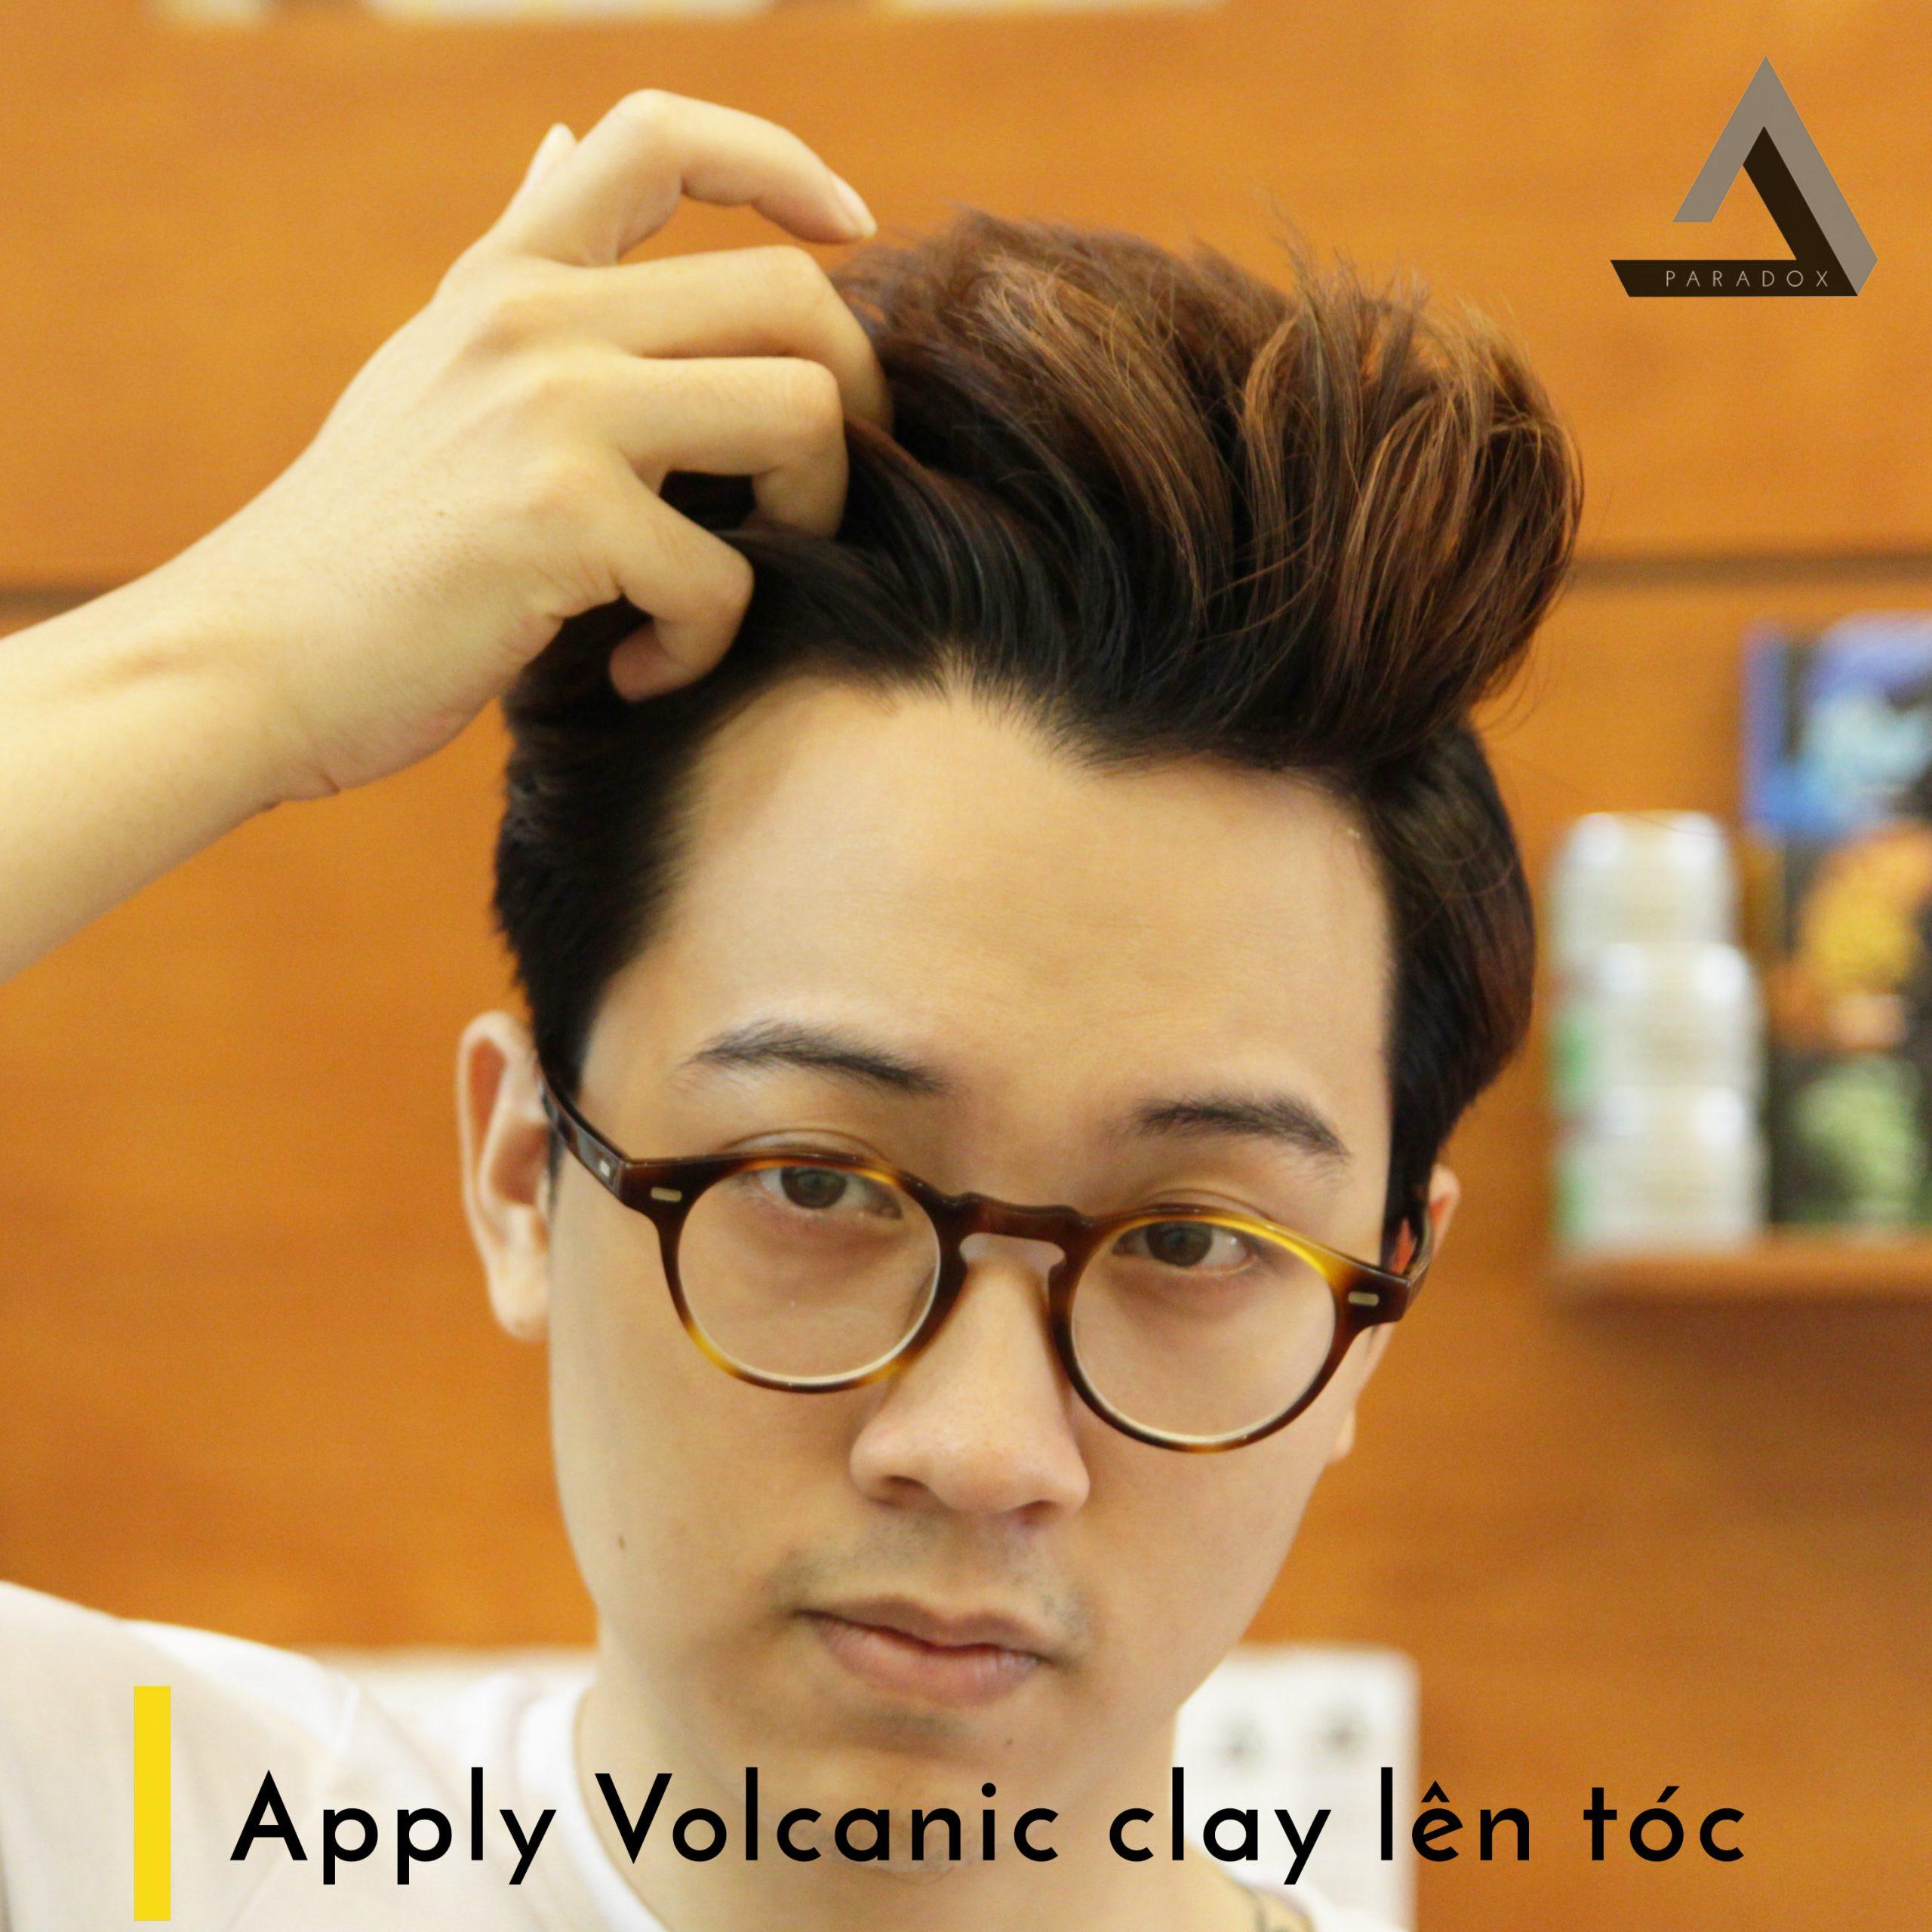 Apply Volcanic clay len toc